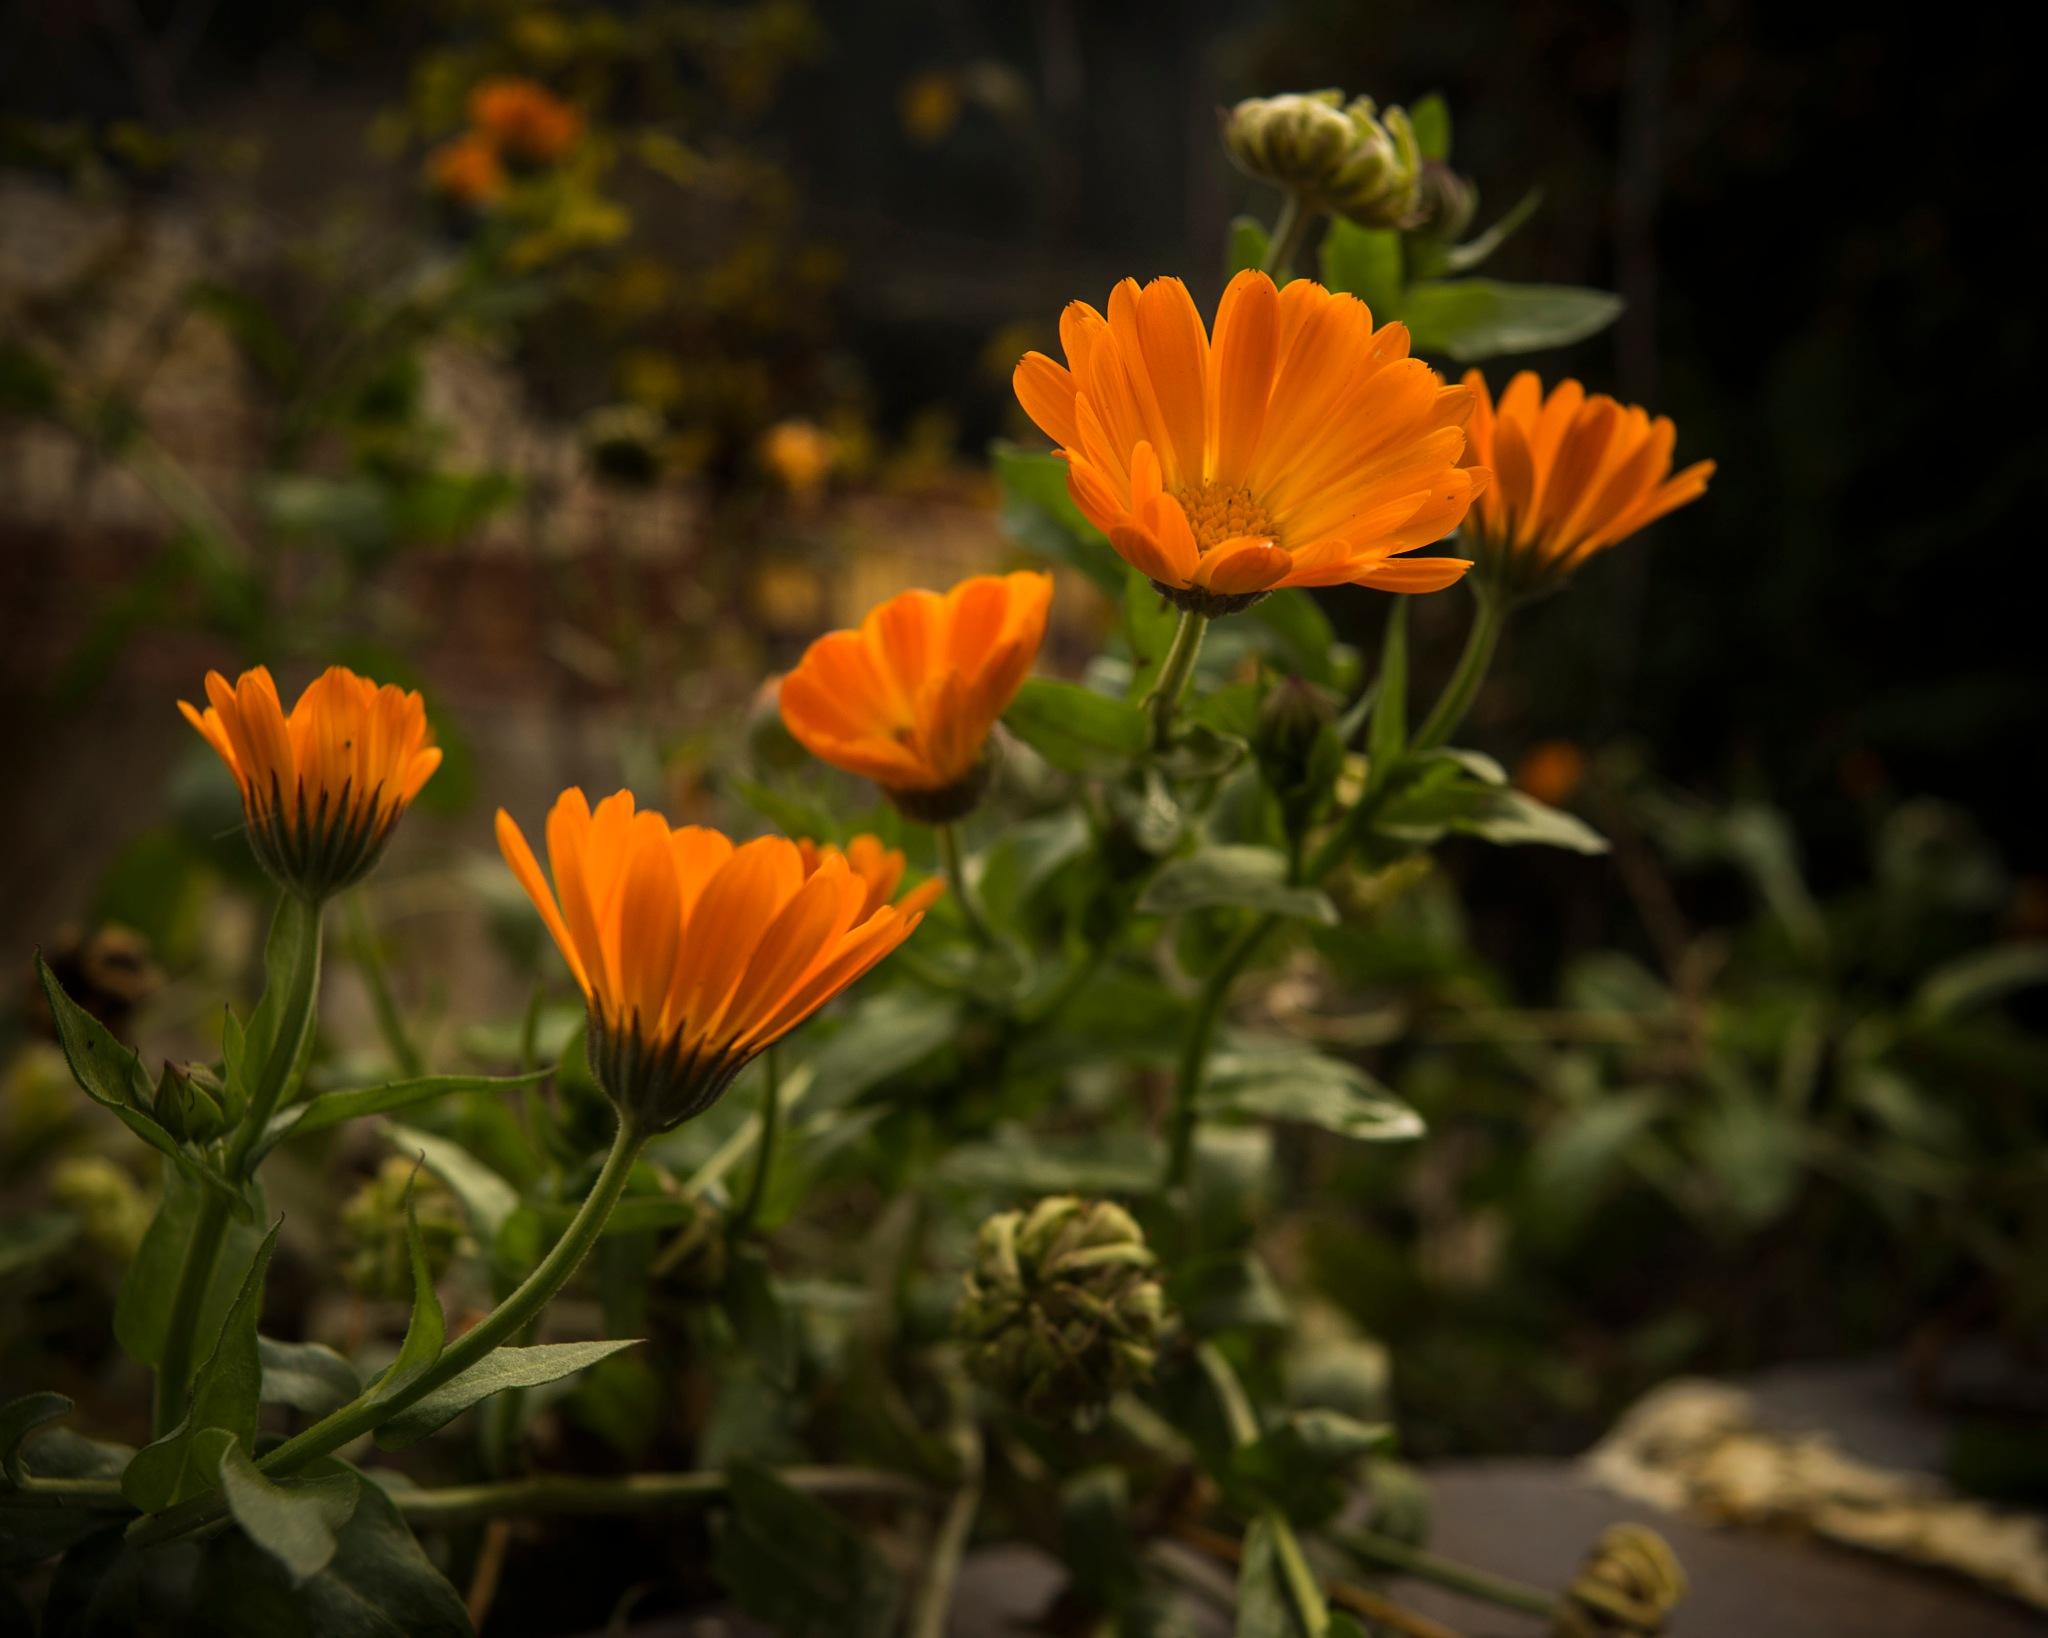 Orange flowers of the autumn by Bogdan Udrescu